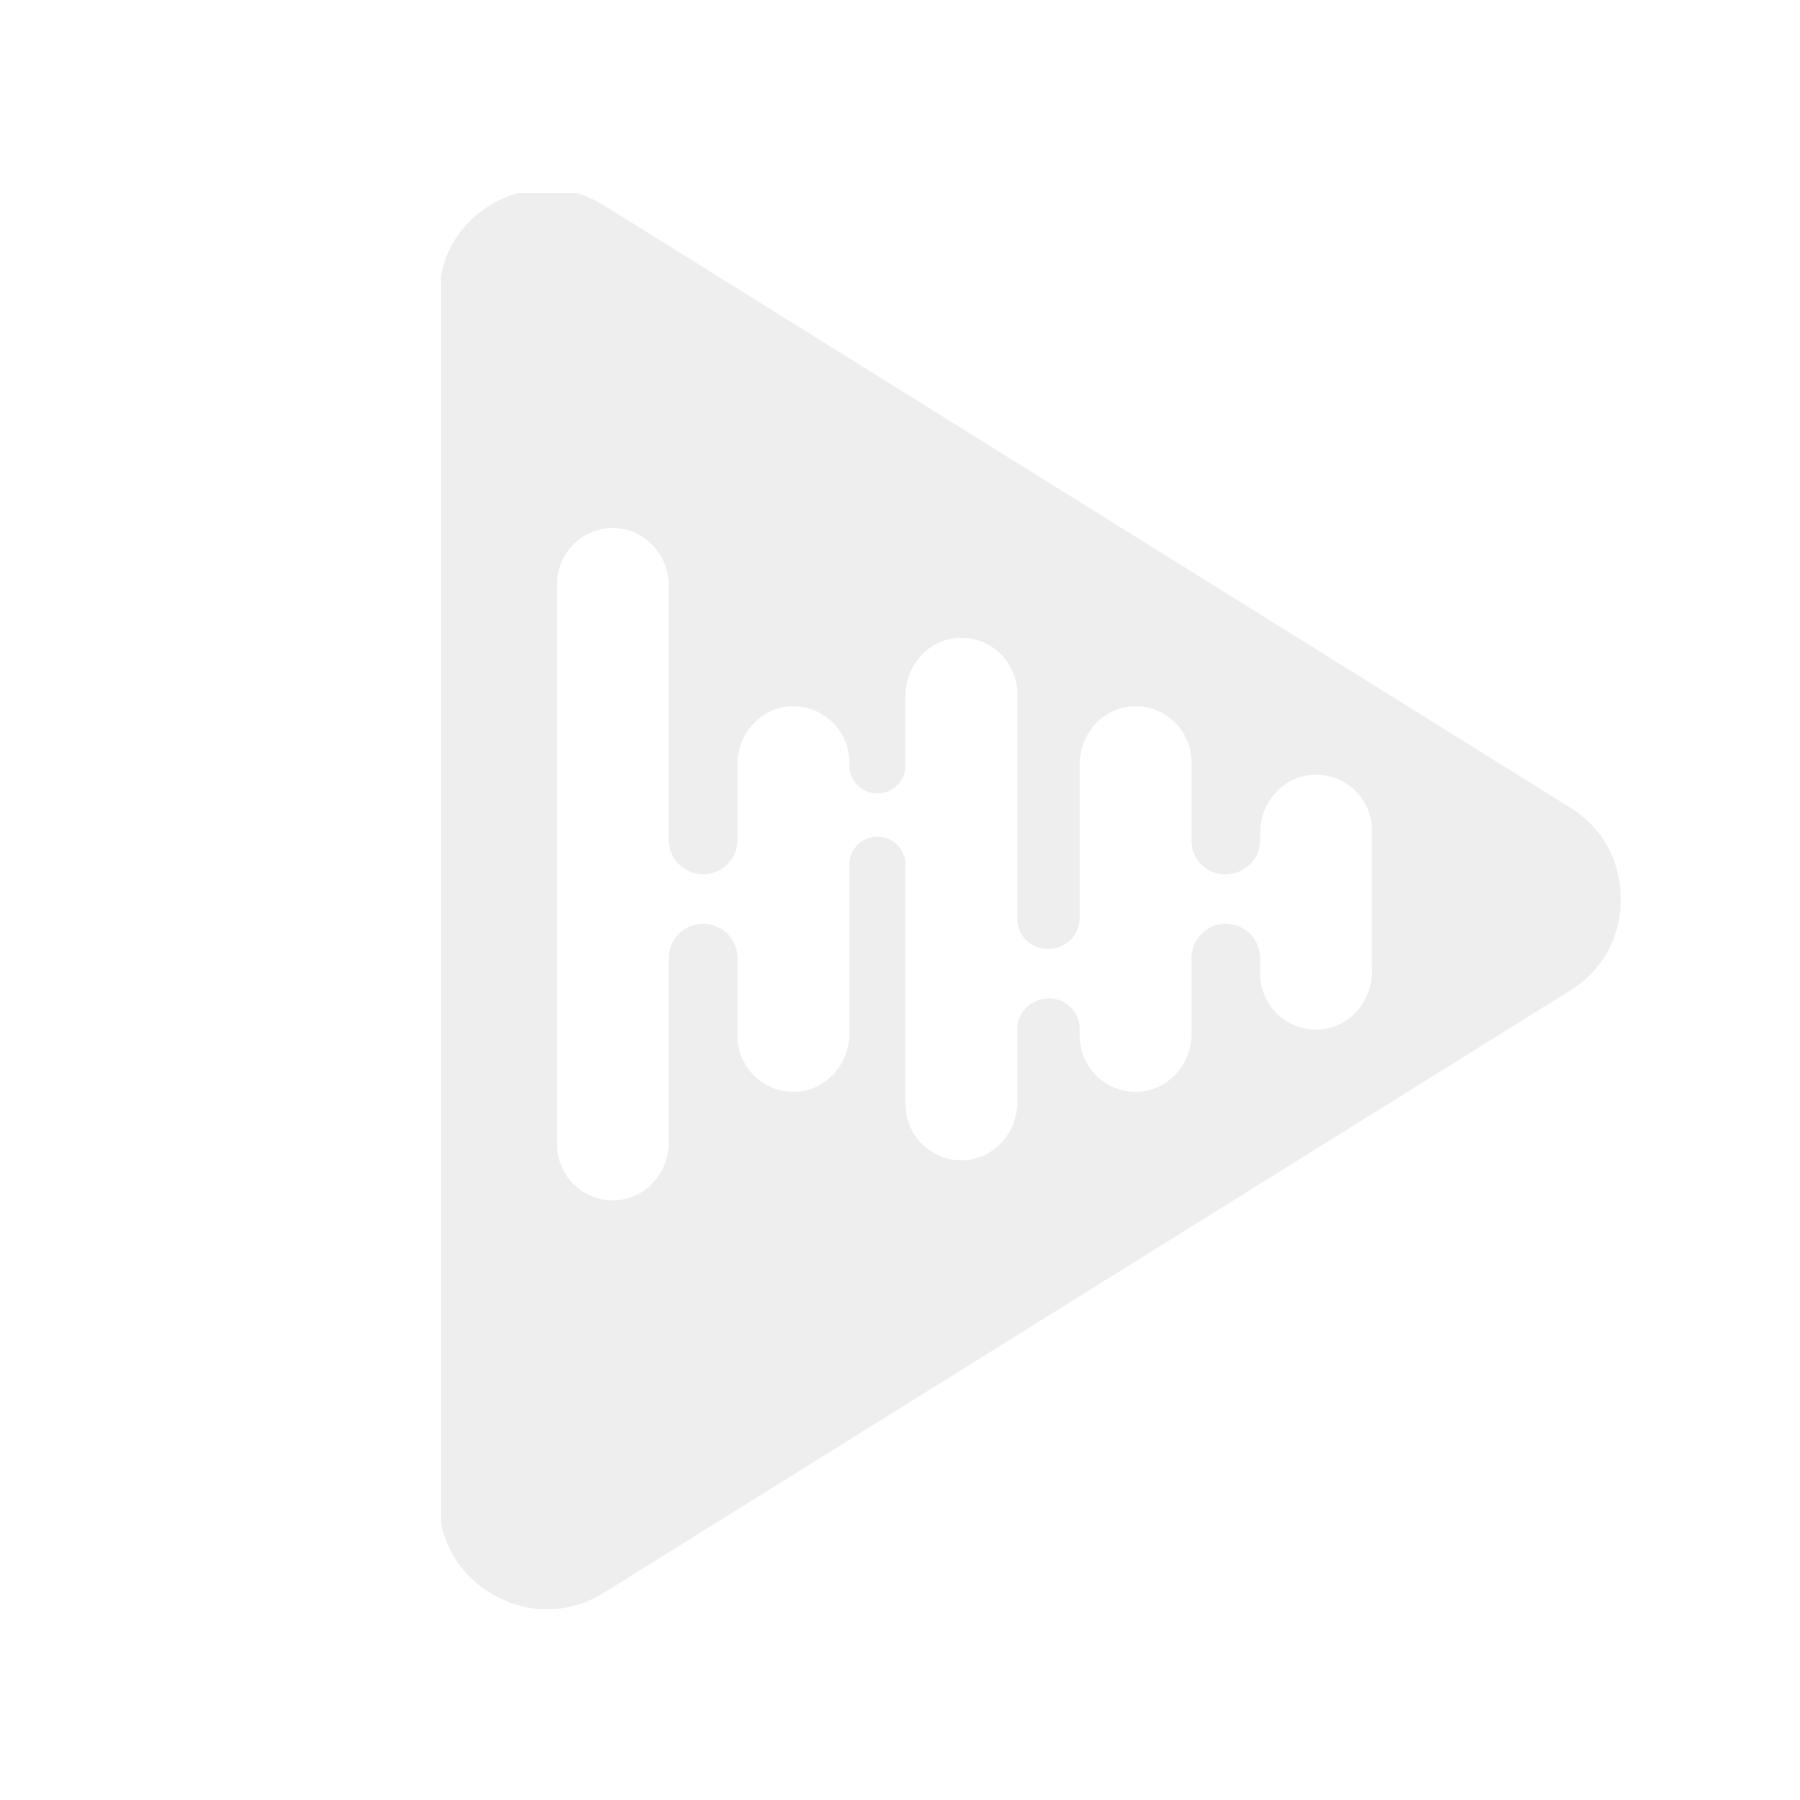 Speedsignal B-3444723-2